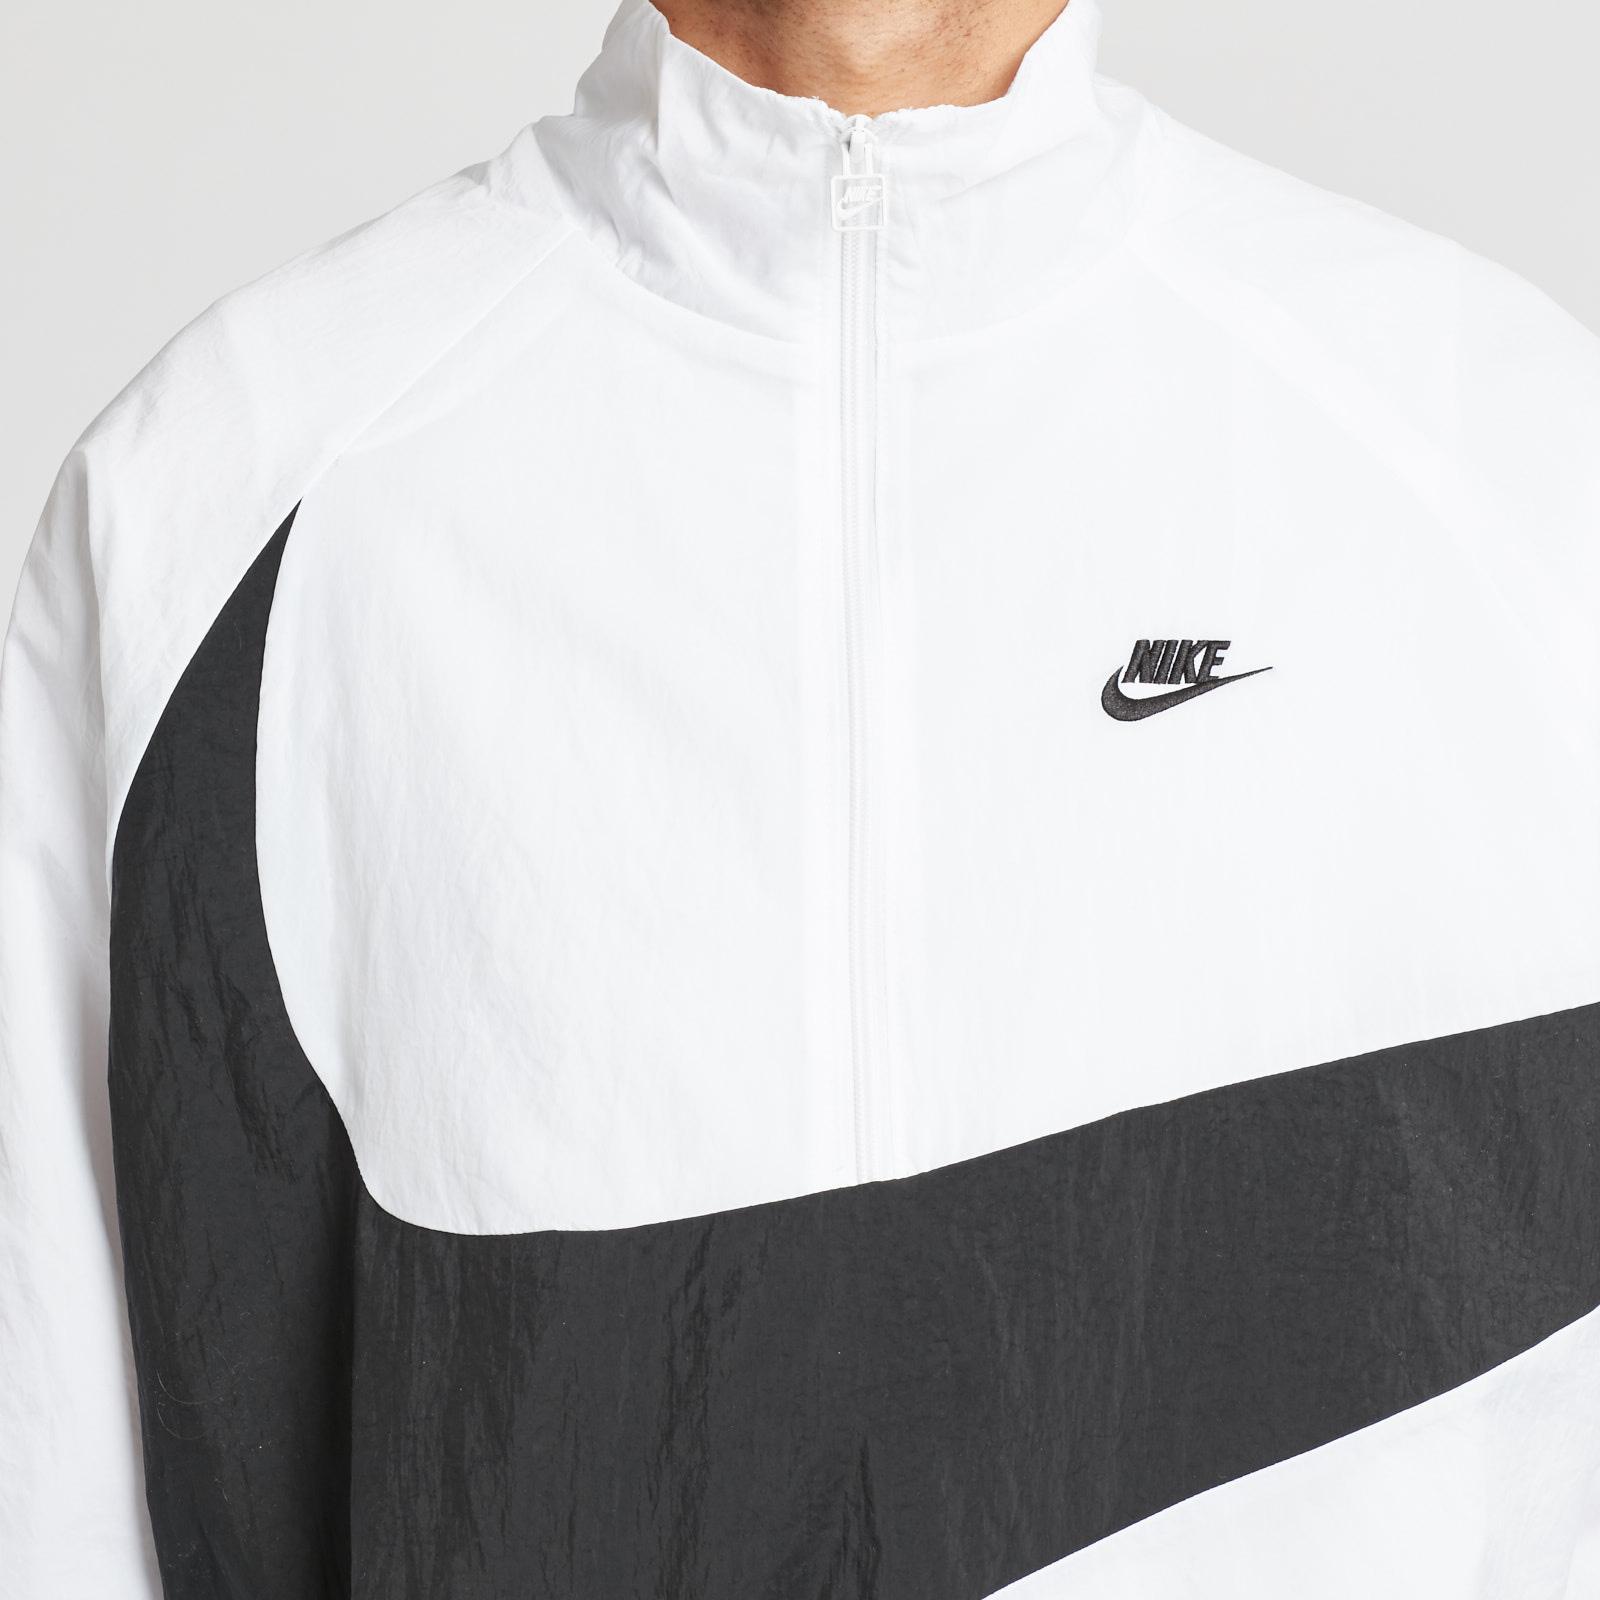 018192f7e699 Nike NSW VW Swoosh Woven Halfzip Jacket - Aj2696-100 ...